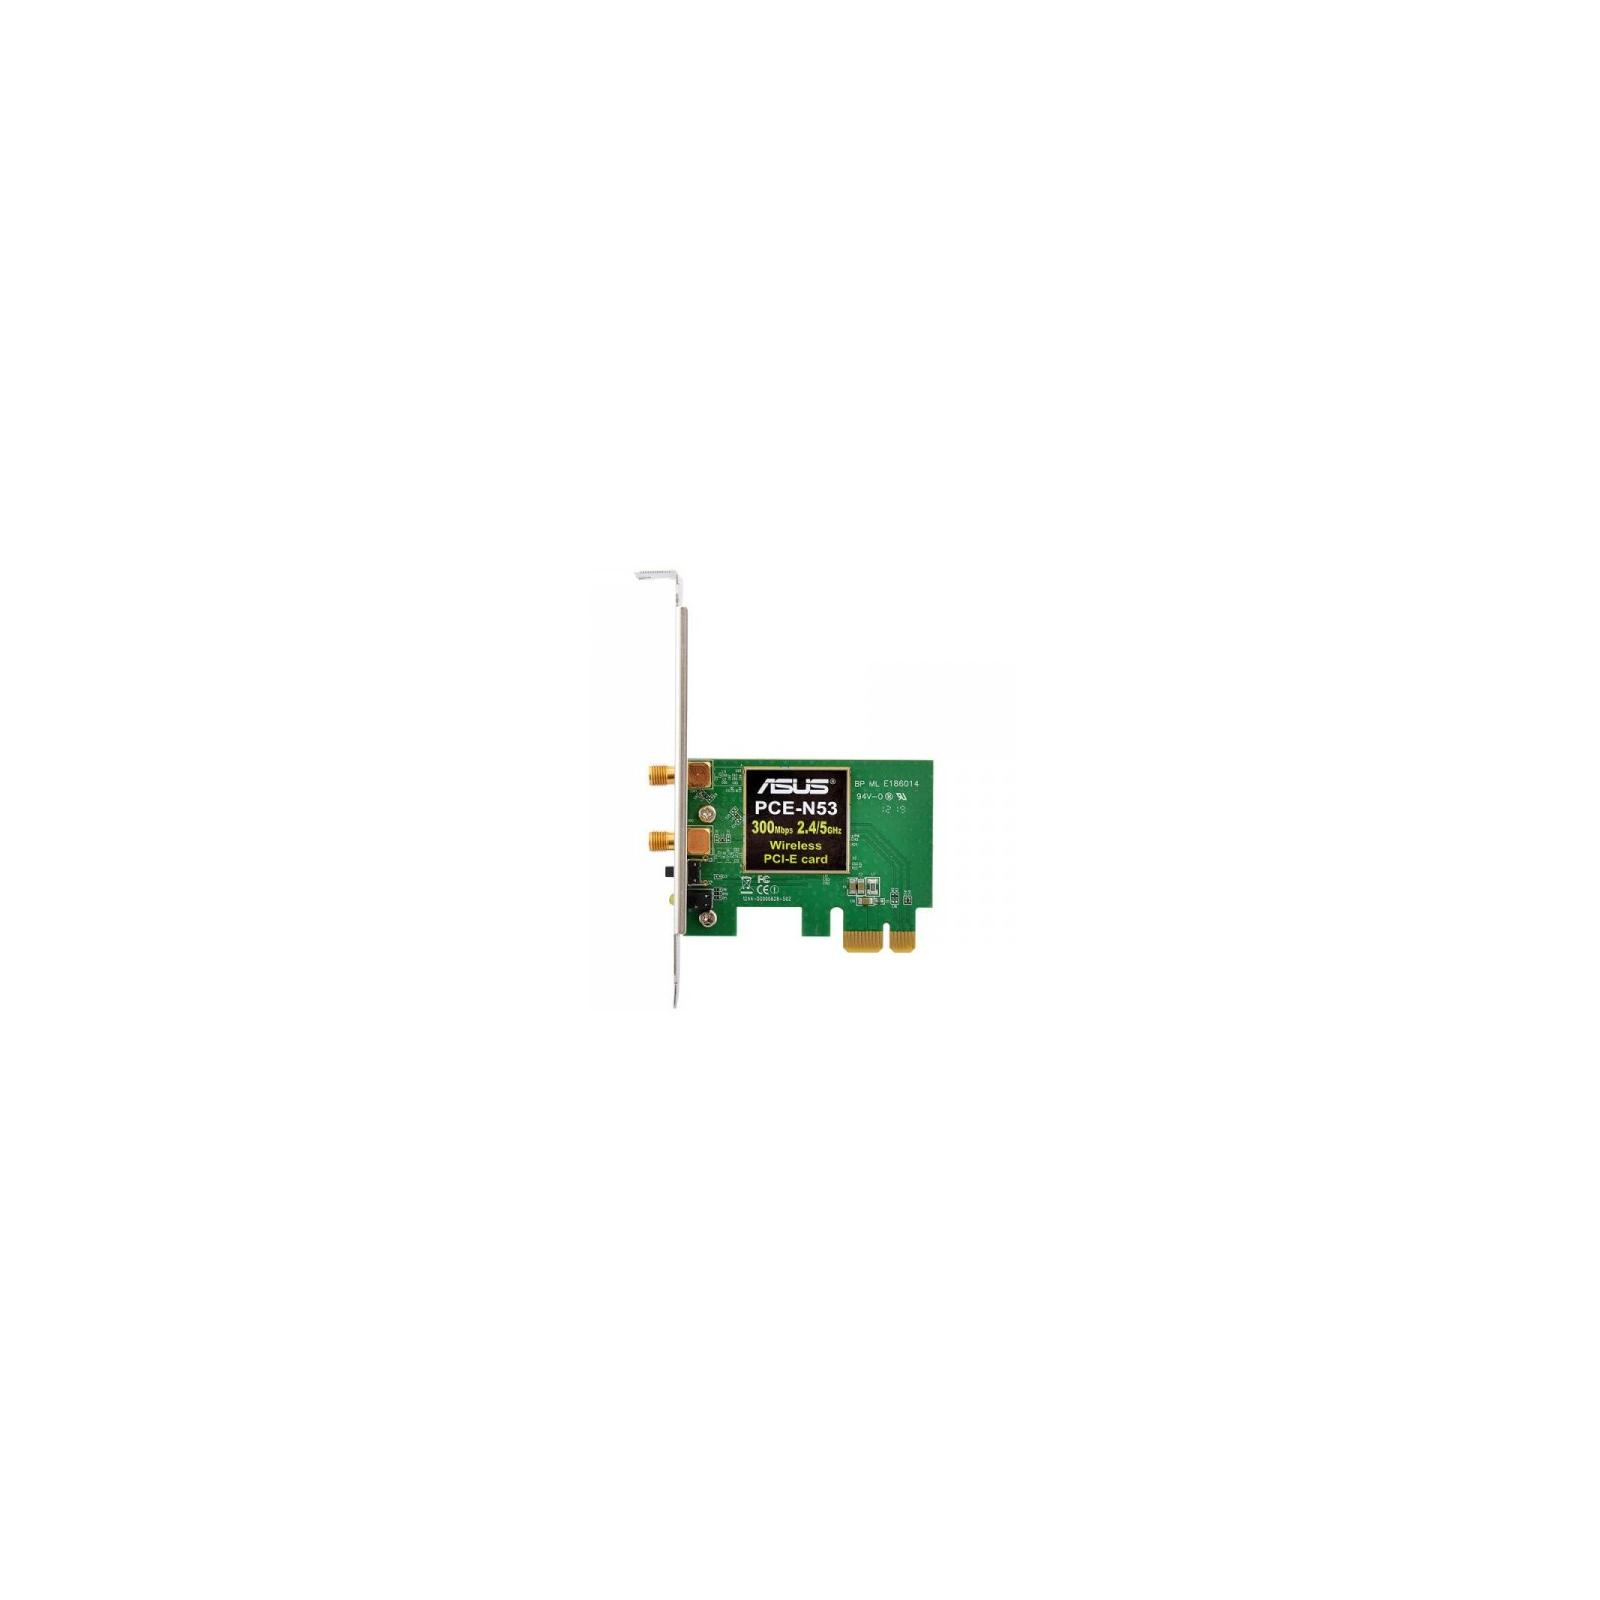 Сетевая карта Wi-Fi ASUS PCE-N53 изображение 5